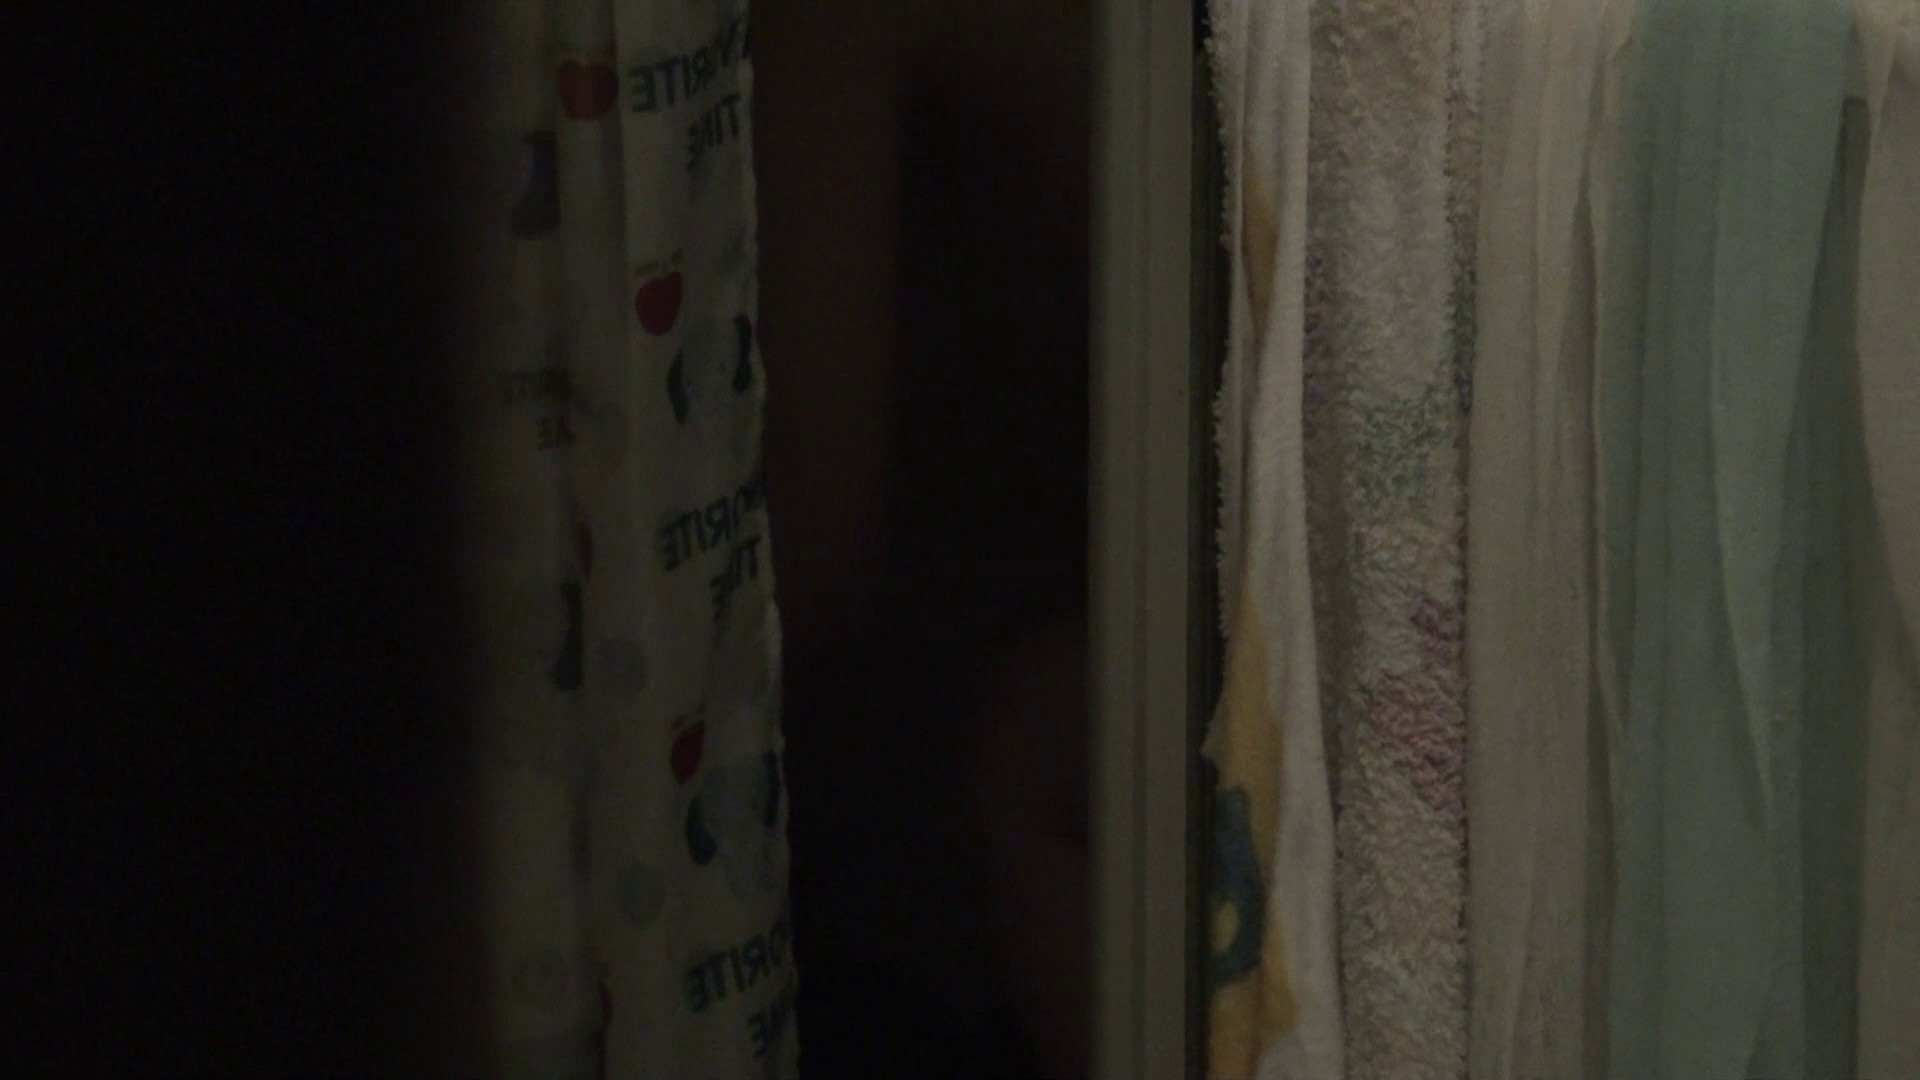 vol.06顔を洗い流す極上お女市さんの裸体をハイビジョンで!風呂上り着替え必見! 民家 オメコ動画キャプチャ 84pic 79